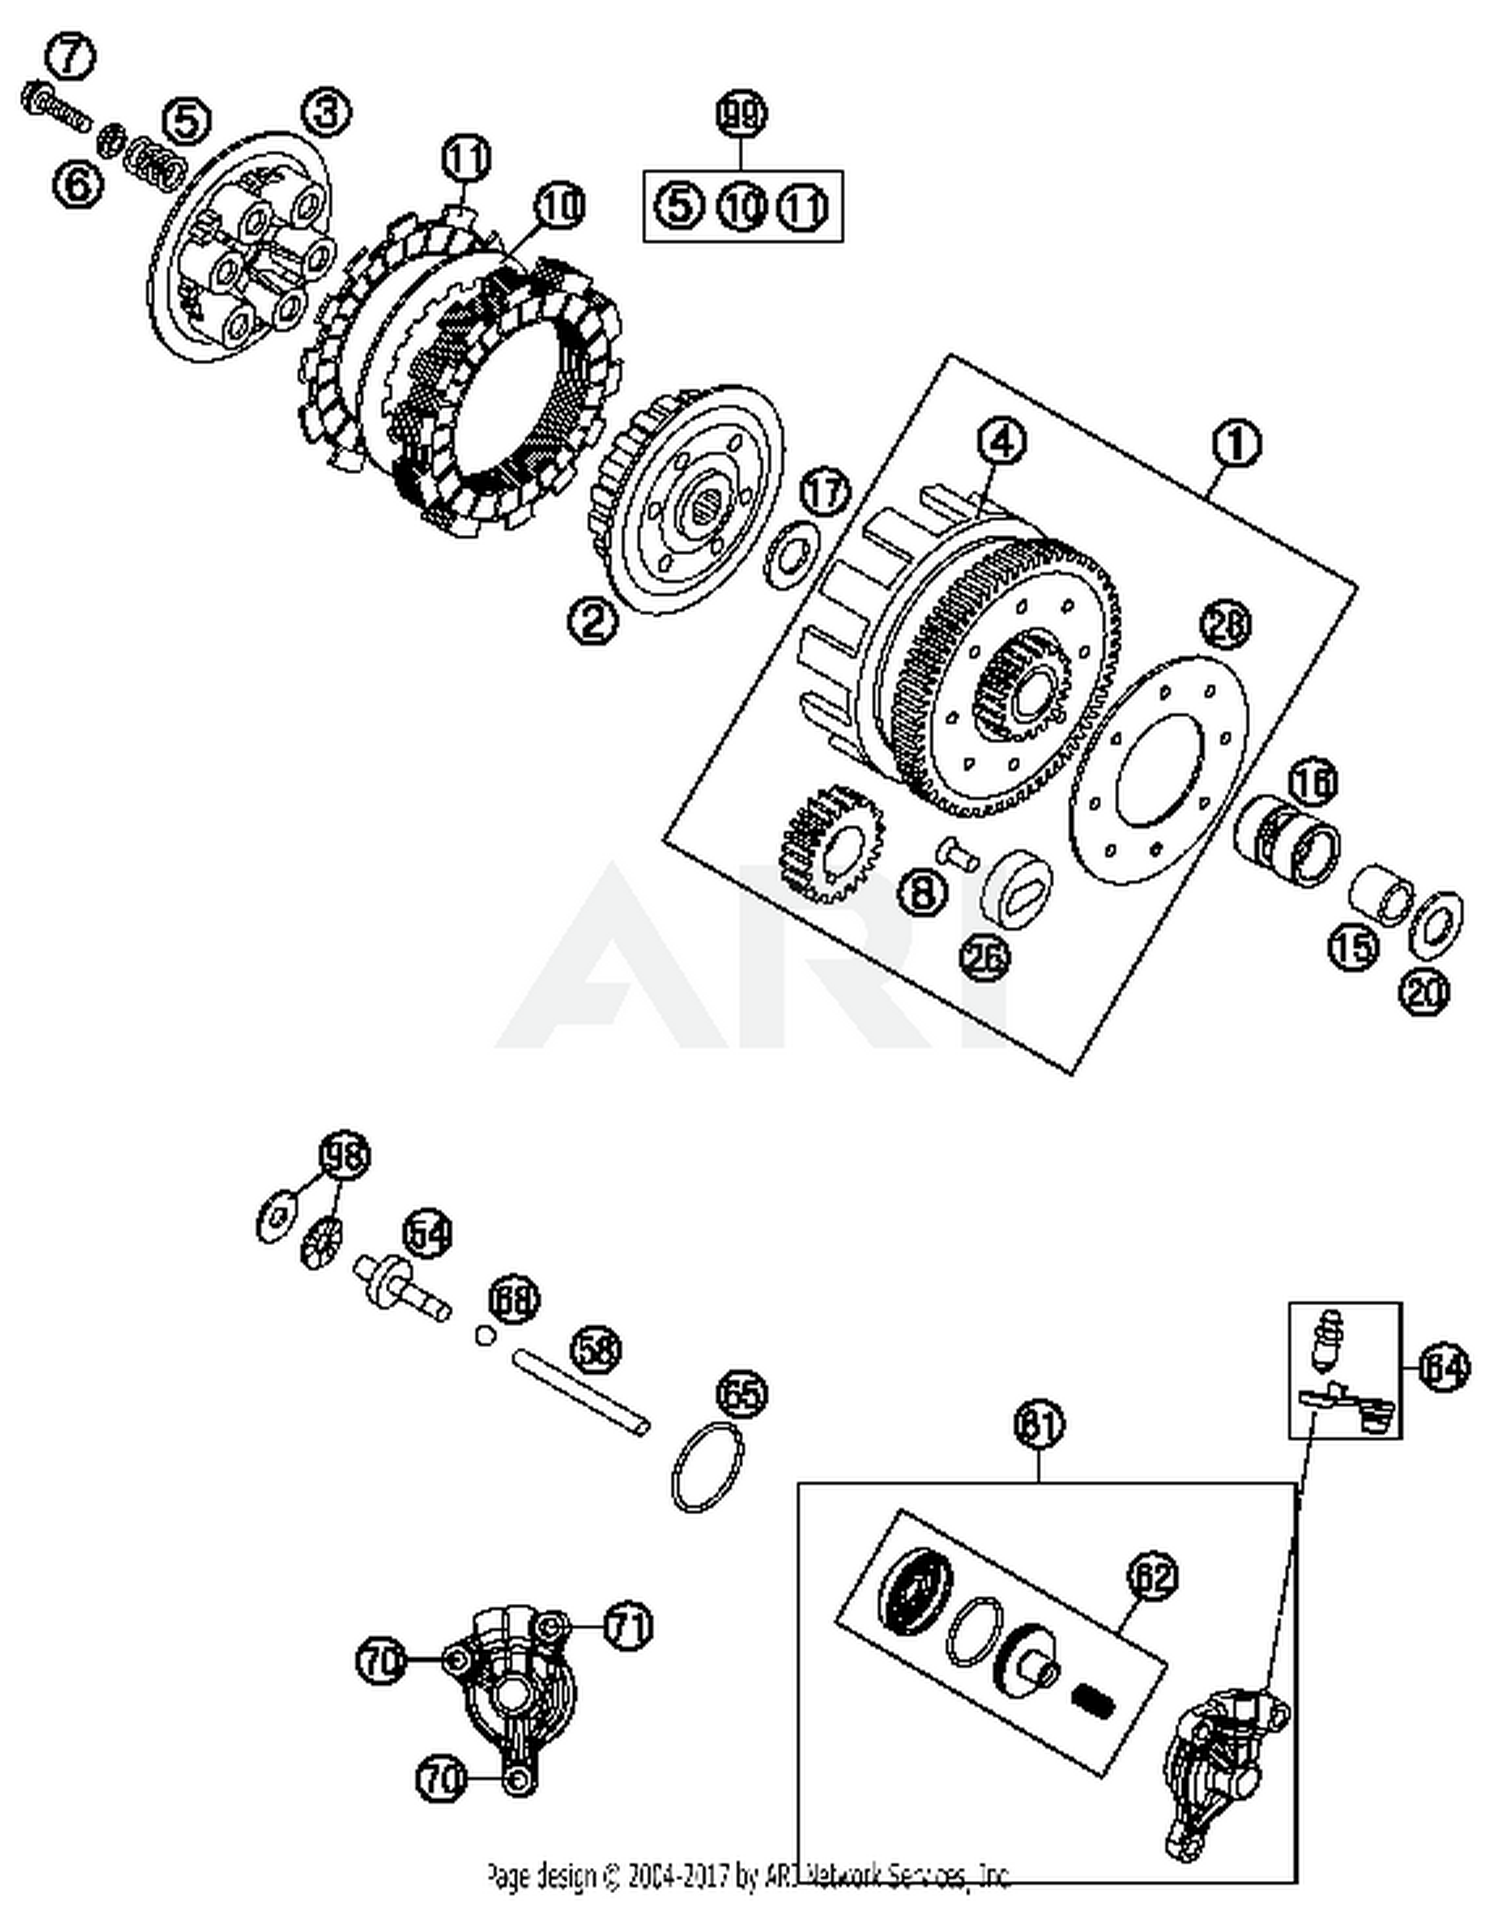 ktm 47032002000 best price on ktm inner clutch hub 85 sx parts at rh bikebandit com XC vs KTM 105 SX KTM Motorcycles 2013